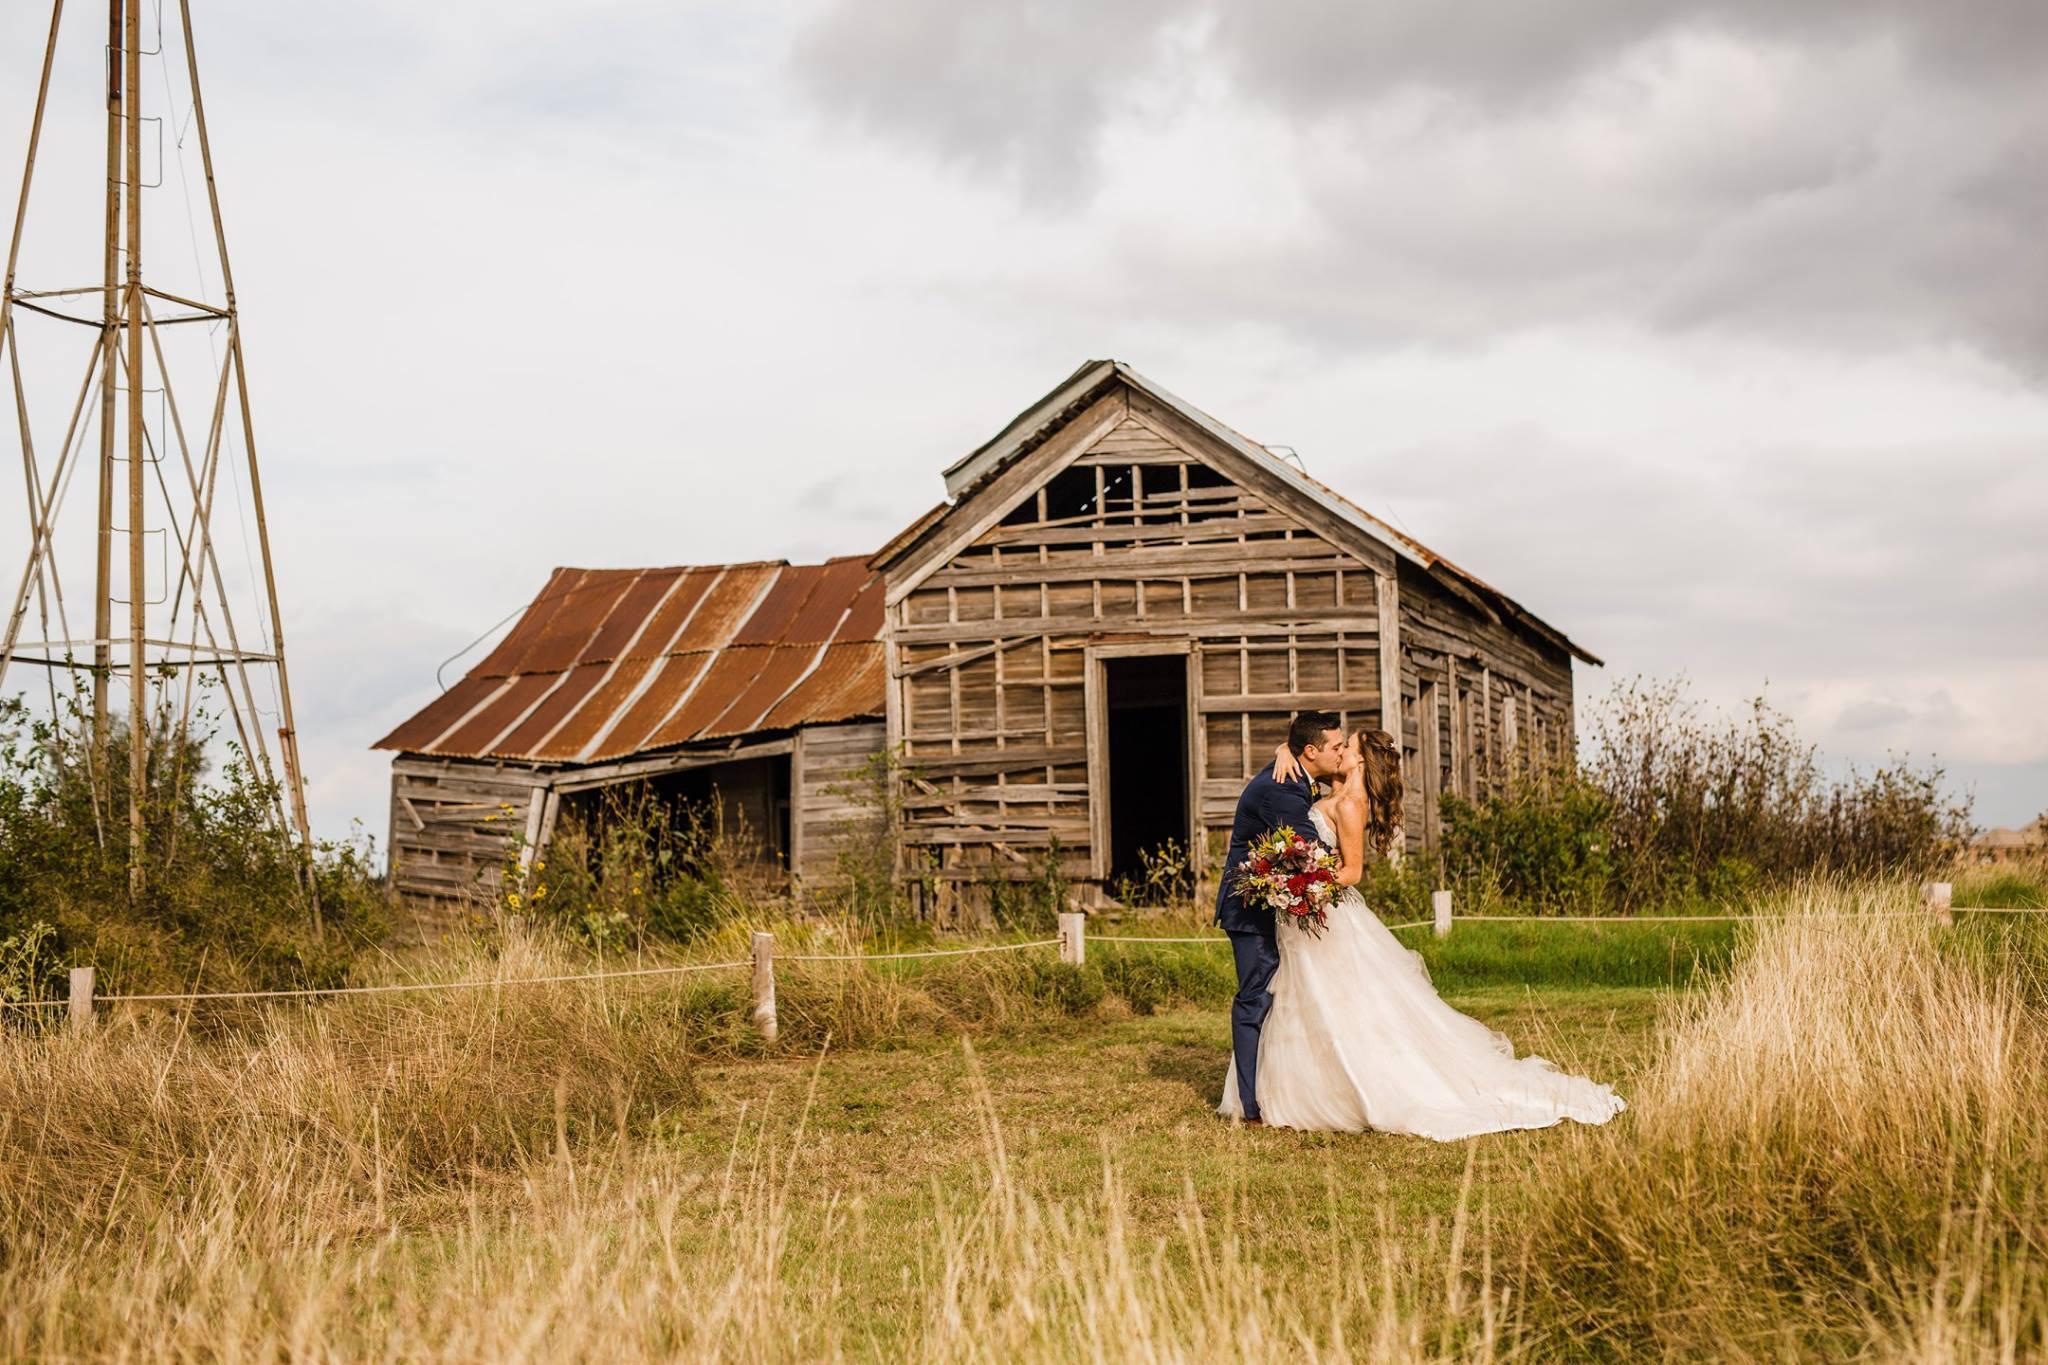 Mcgranahan Barn Wedding Yukon Ok Kellie And Michael Partybox Dj Lighting Photo Booths